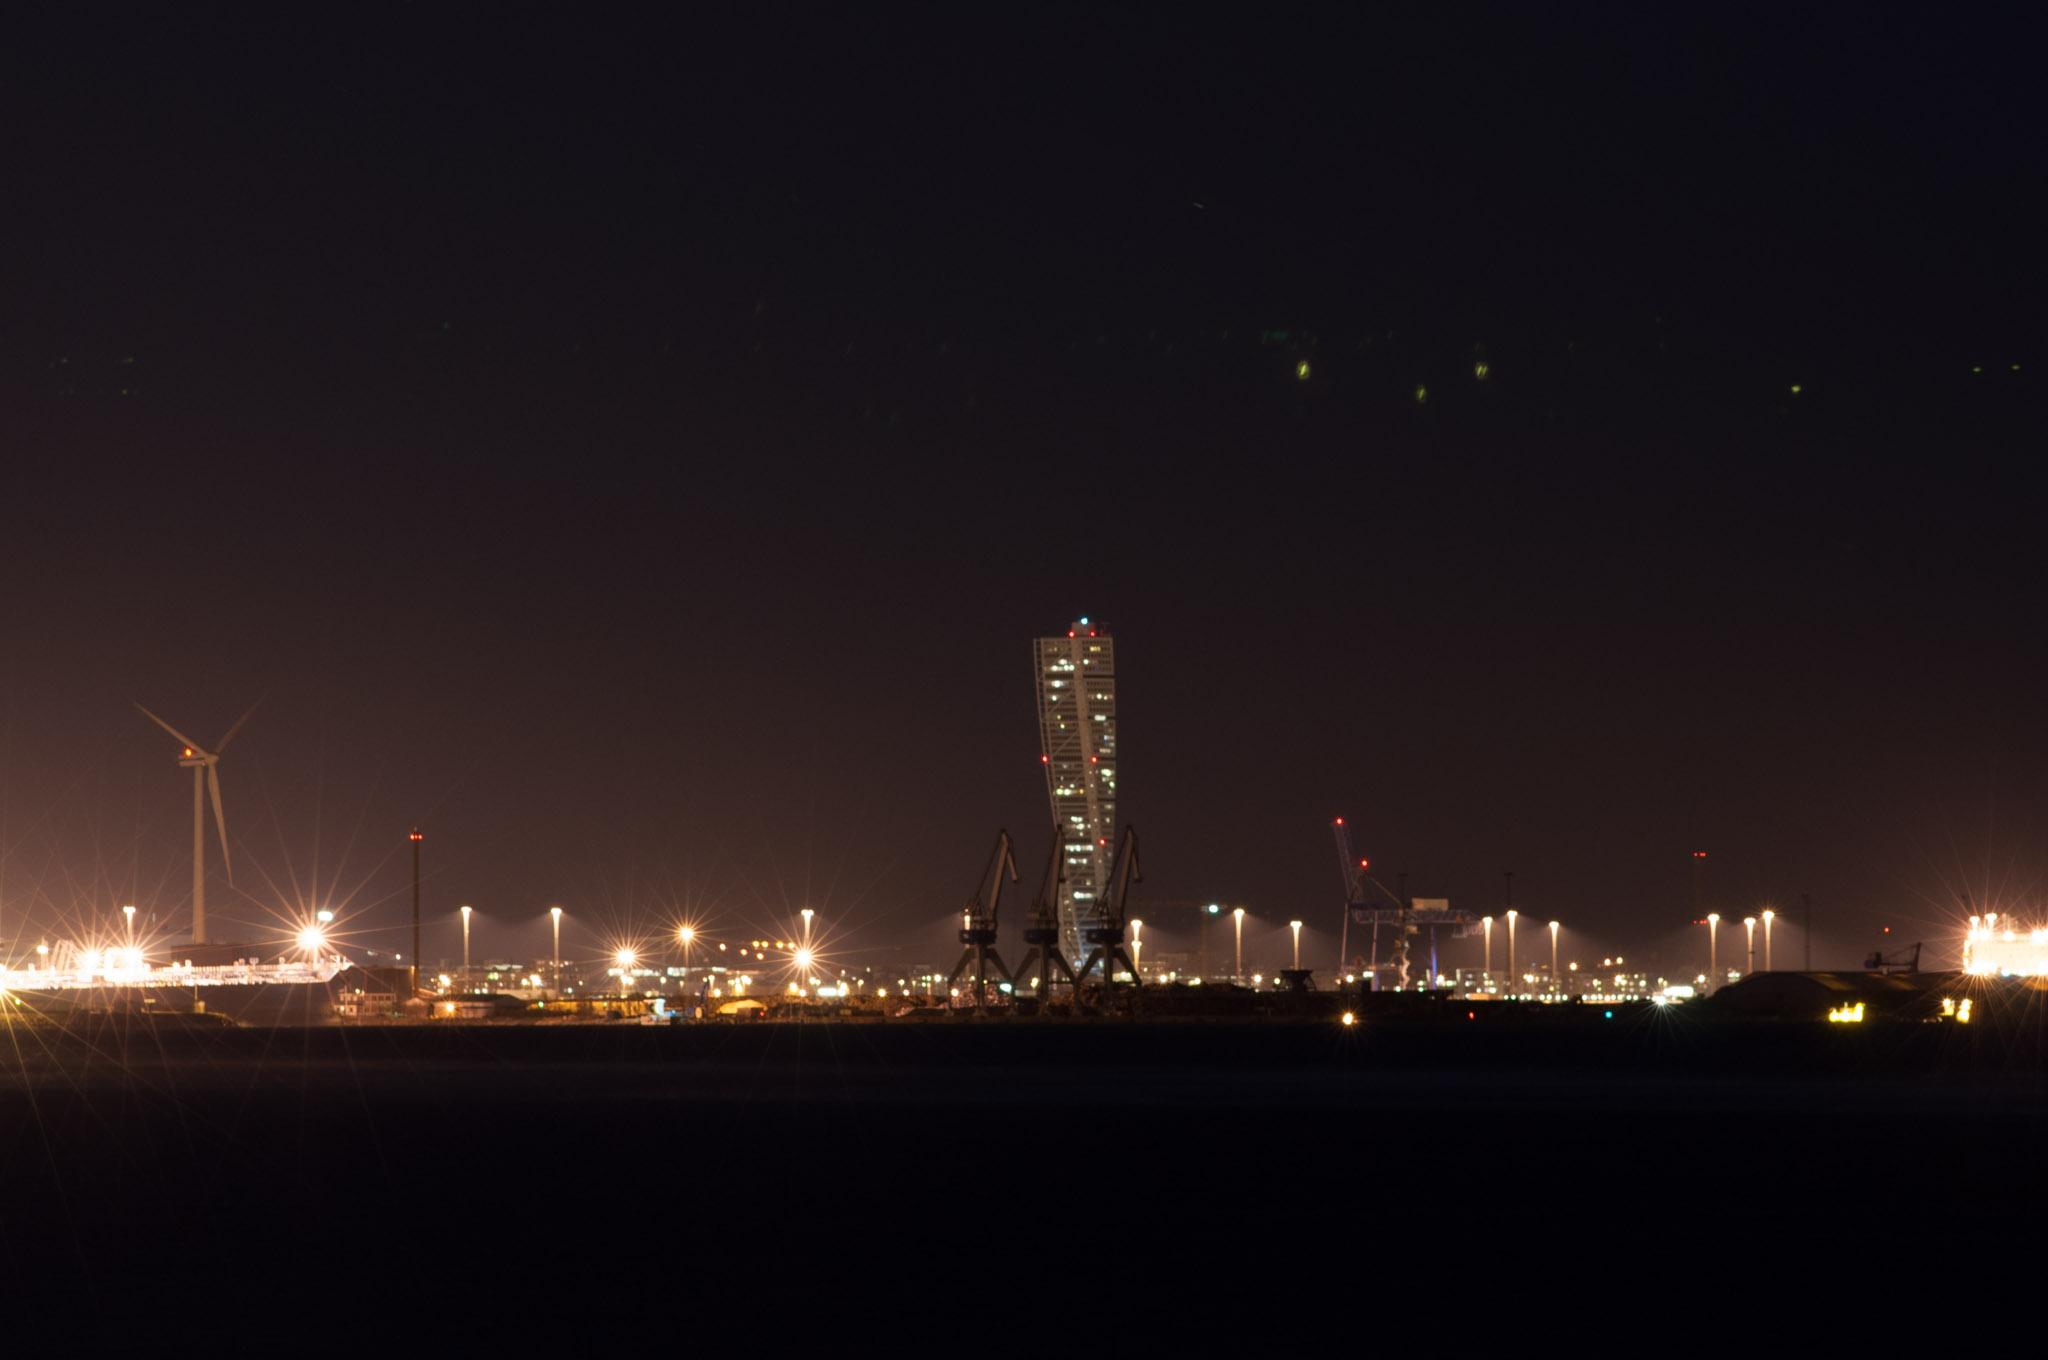 Night photo with fake panorama.